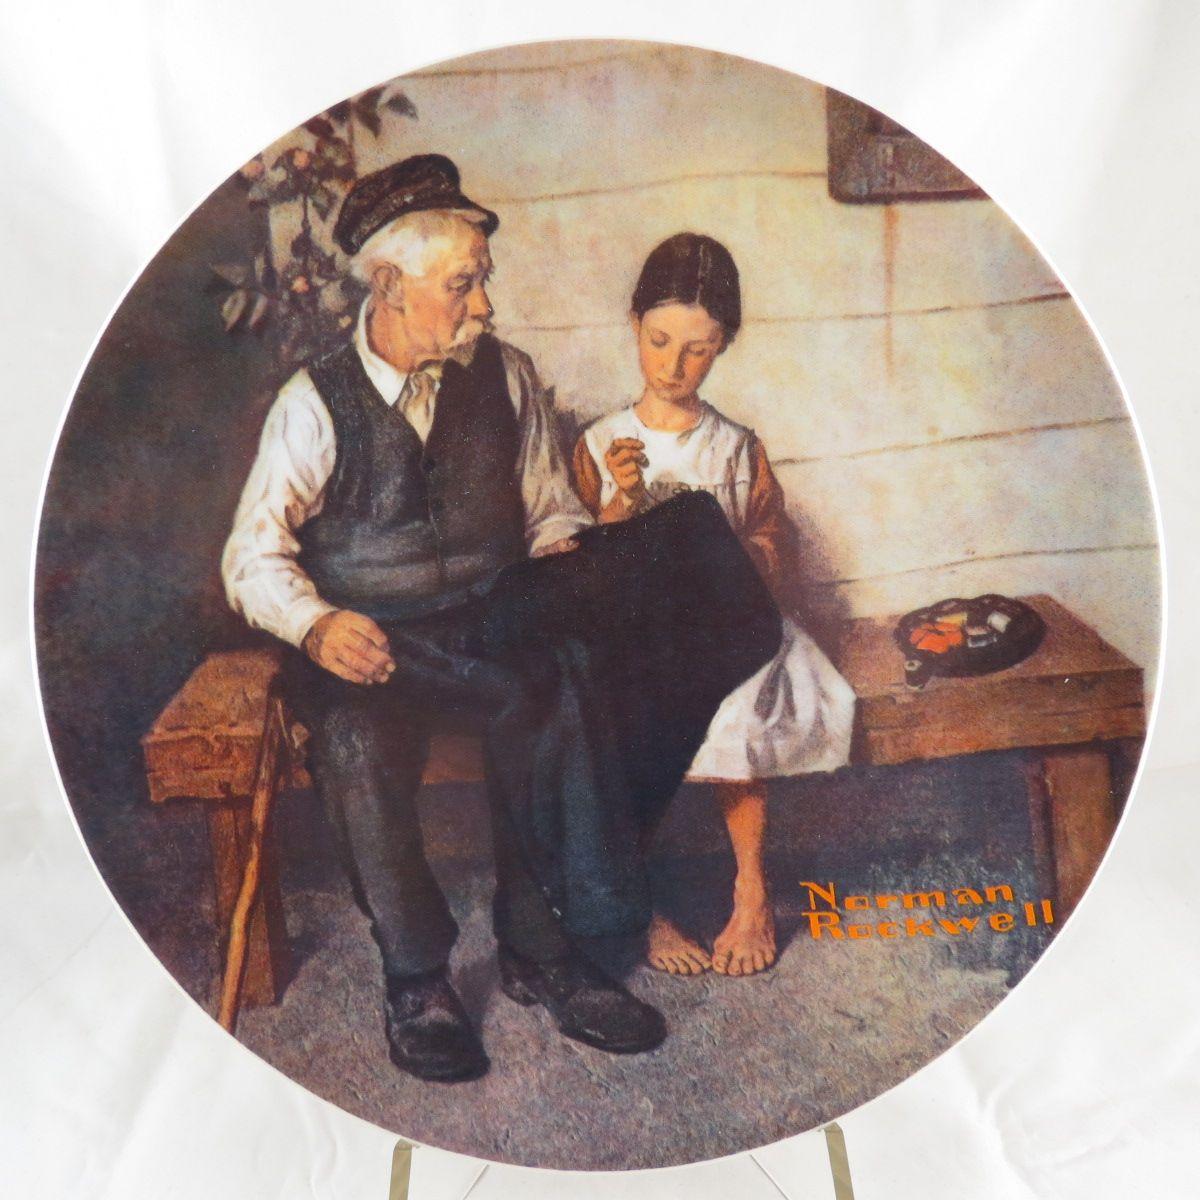 "Декоративная коллекционная тарелка ""Коллекция Наследие: Дочь Смотрителя Маяка"". Фарфор, деколь. США, Edwin M.Knowles China Company, Норман Роквелл, 1979"